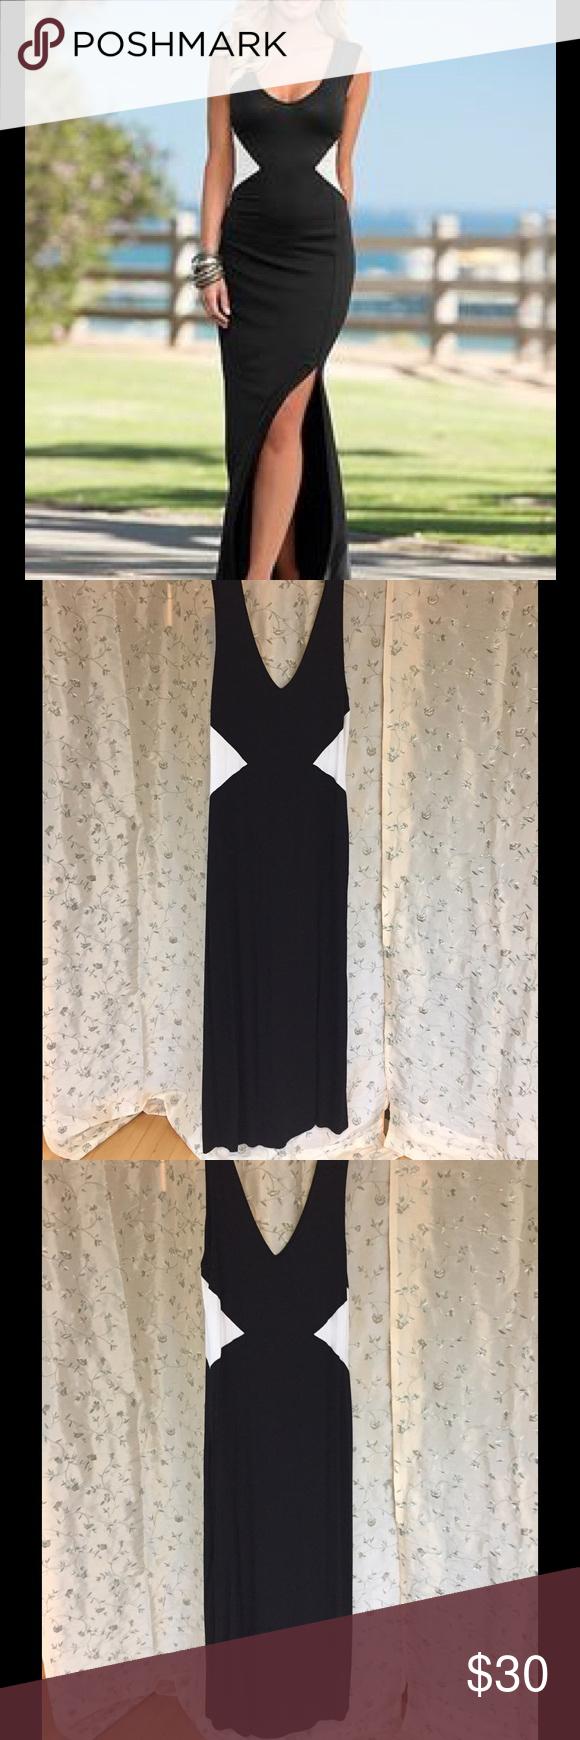 Venus Maxi Dress Black and white 100% viscose maxi dress Venus Clothing Dresses Maxi